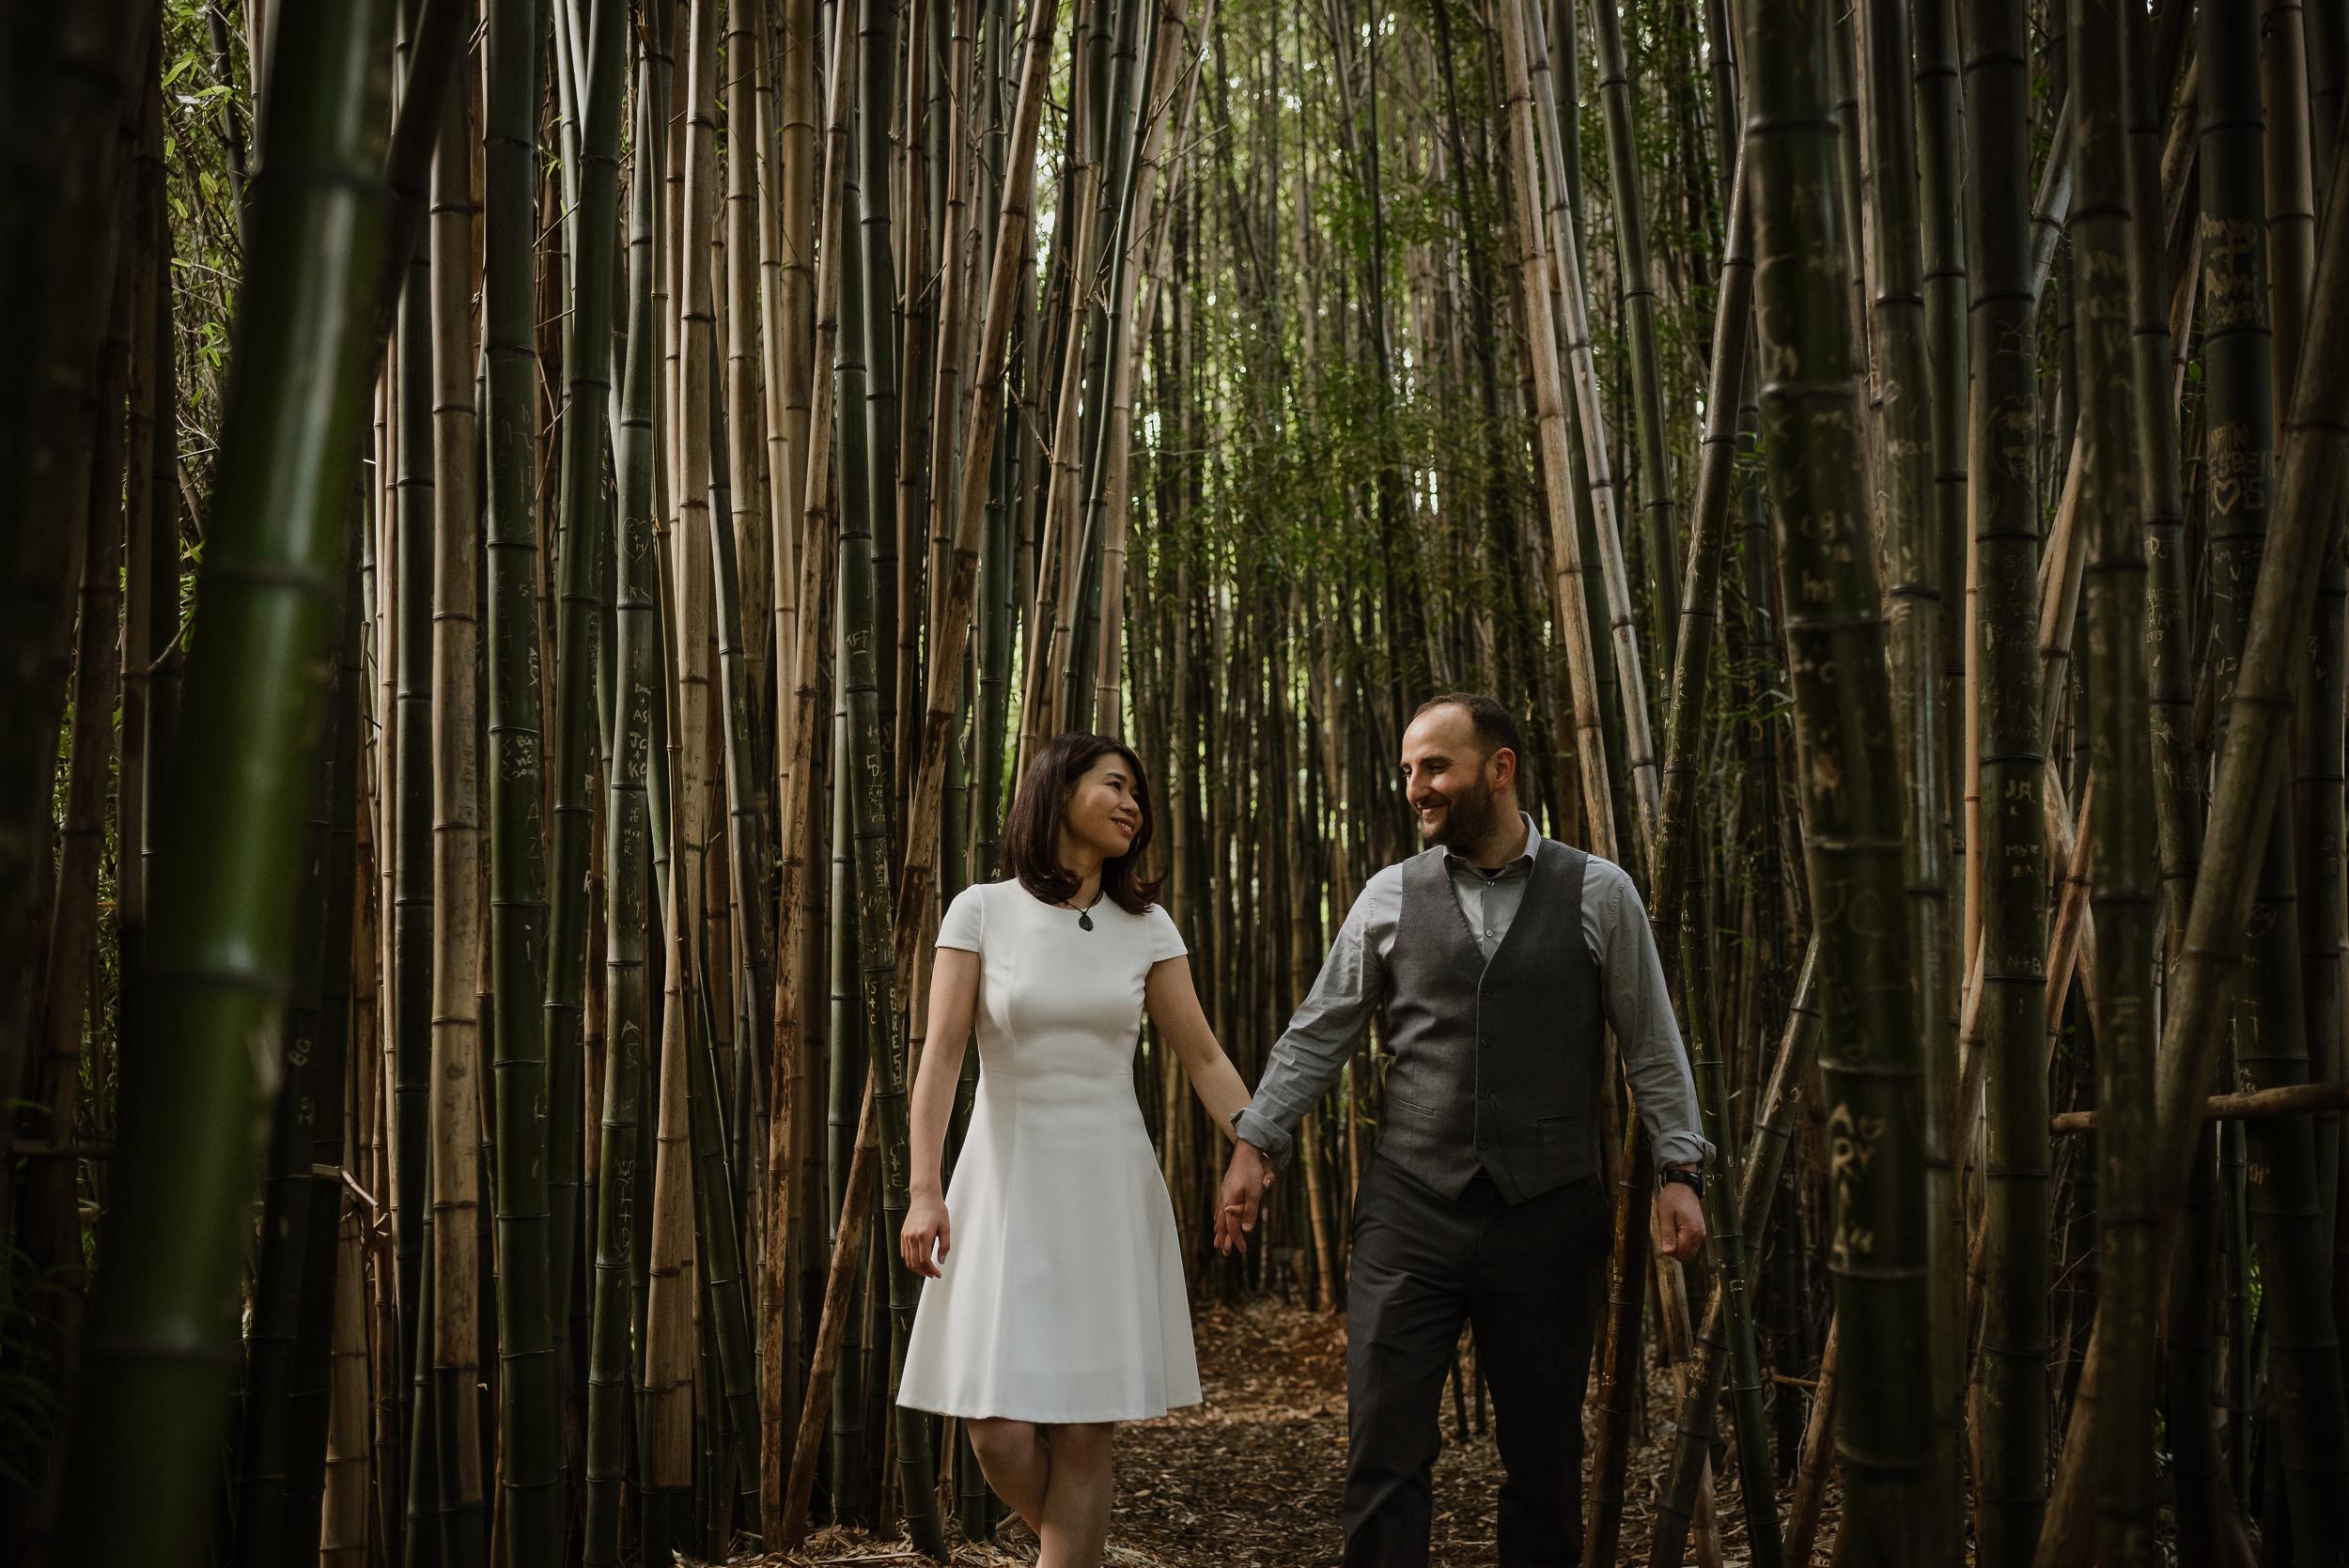 bamboo-pond-san-francisco-botanical-garden-engagement-shoot-vivianchen-128.jpg